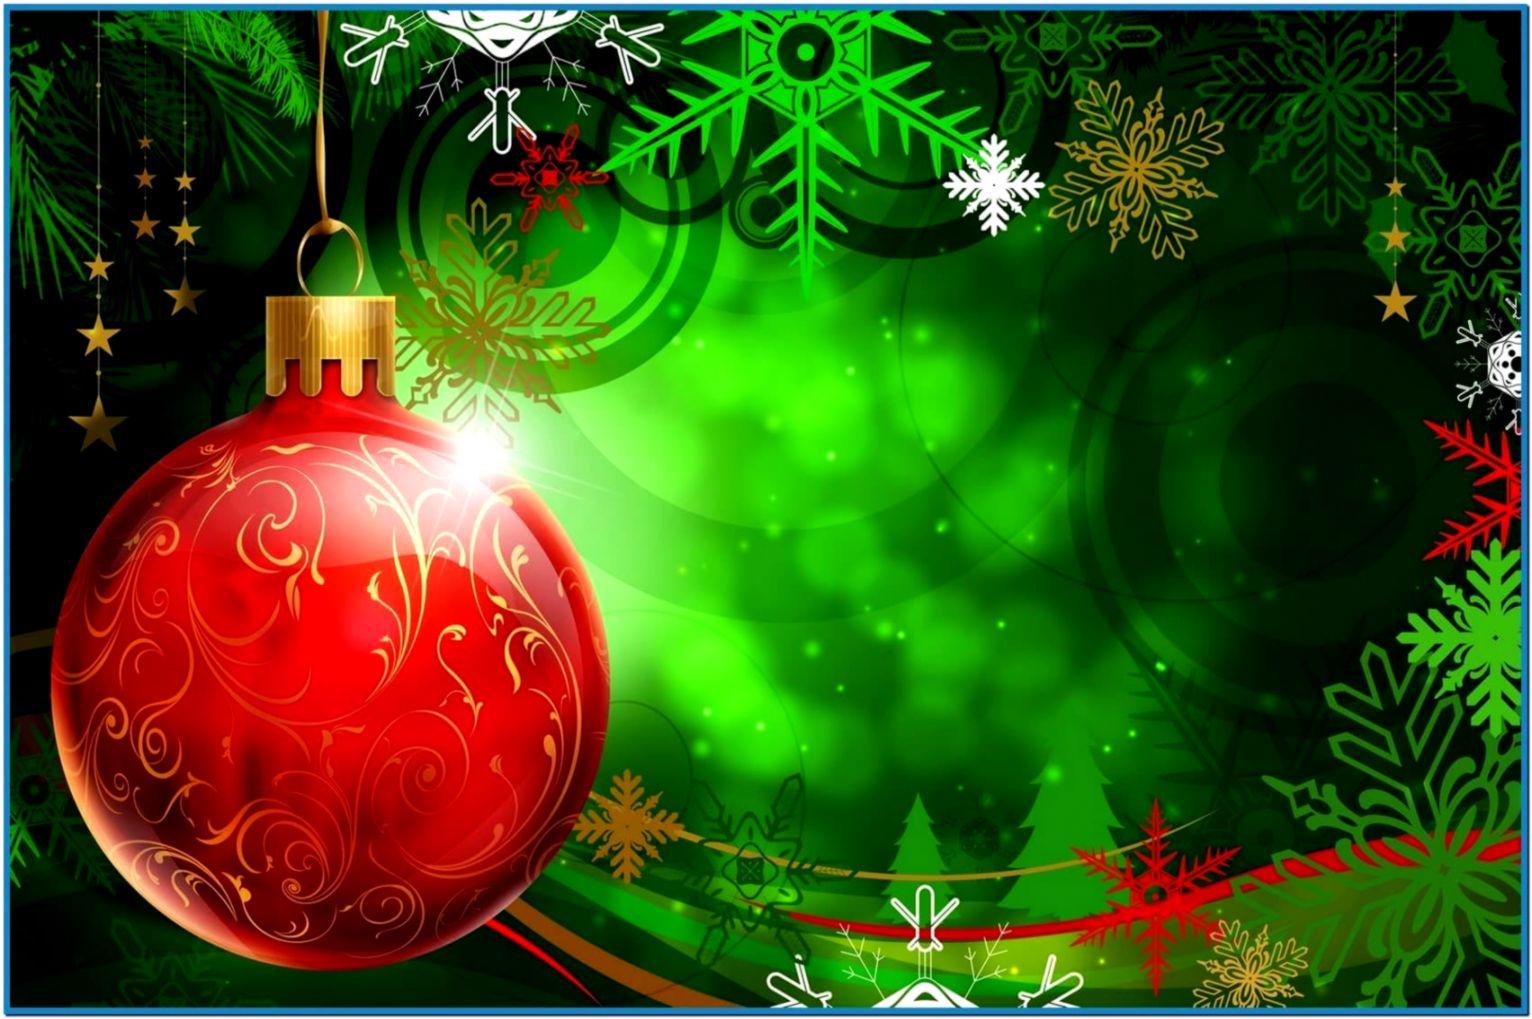 Christmas Wallpaper And Screensaver The Champion Wallpapers